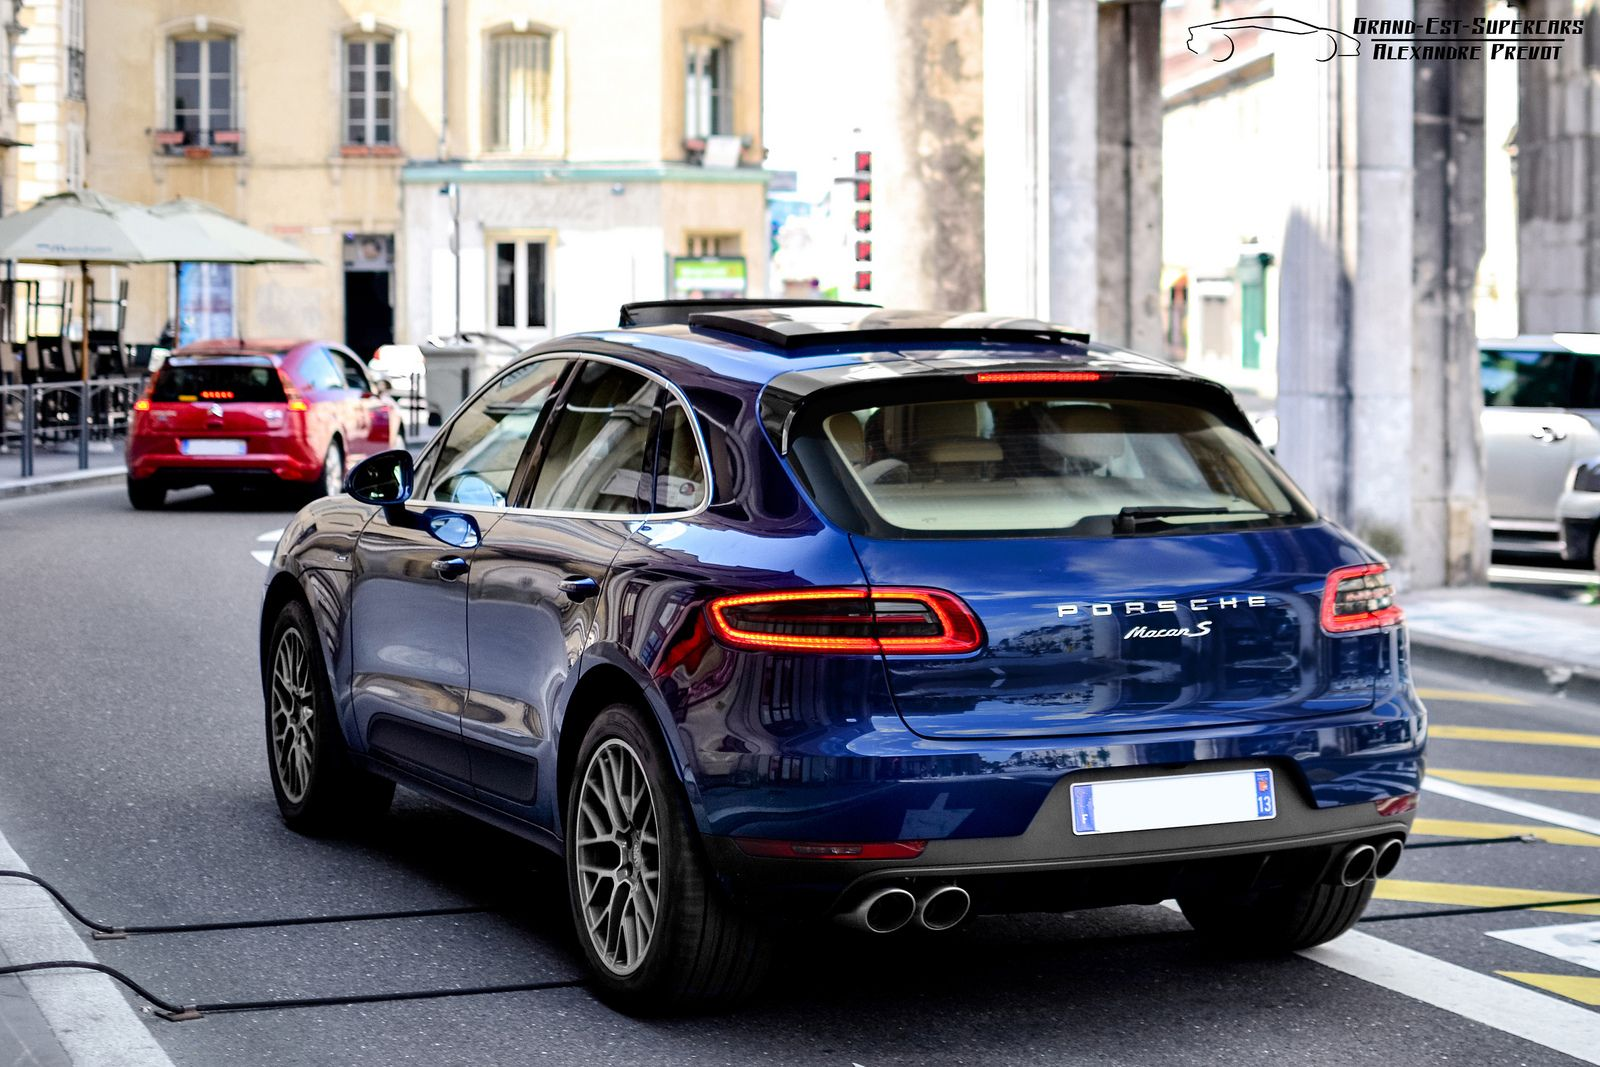 Porsche Macan S Porsche Macan S Porsche Porsche Sports Car